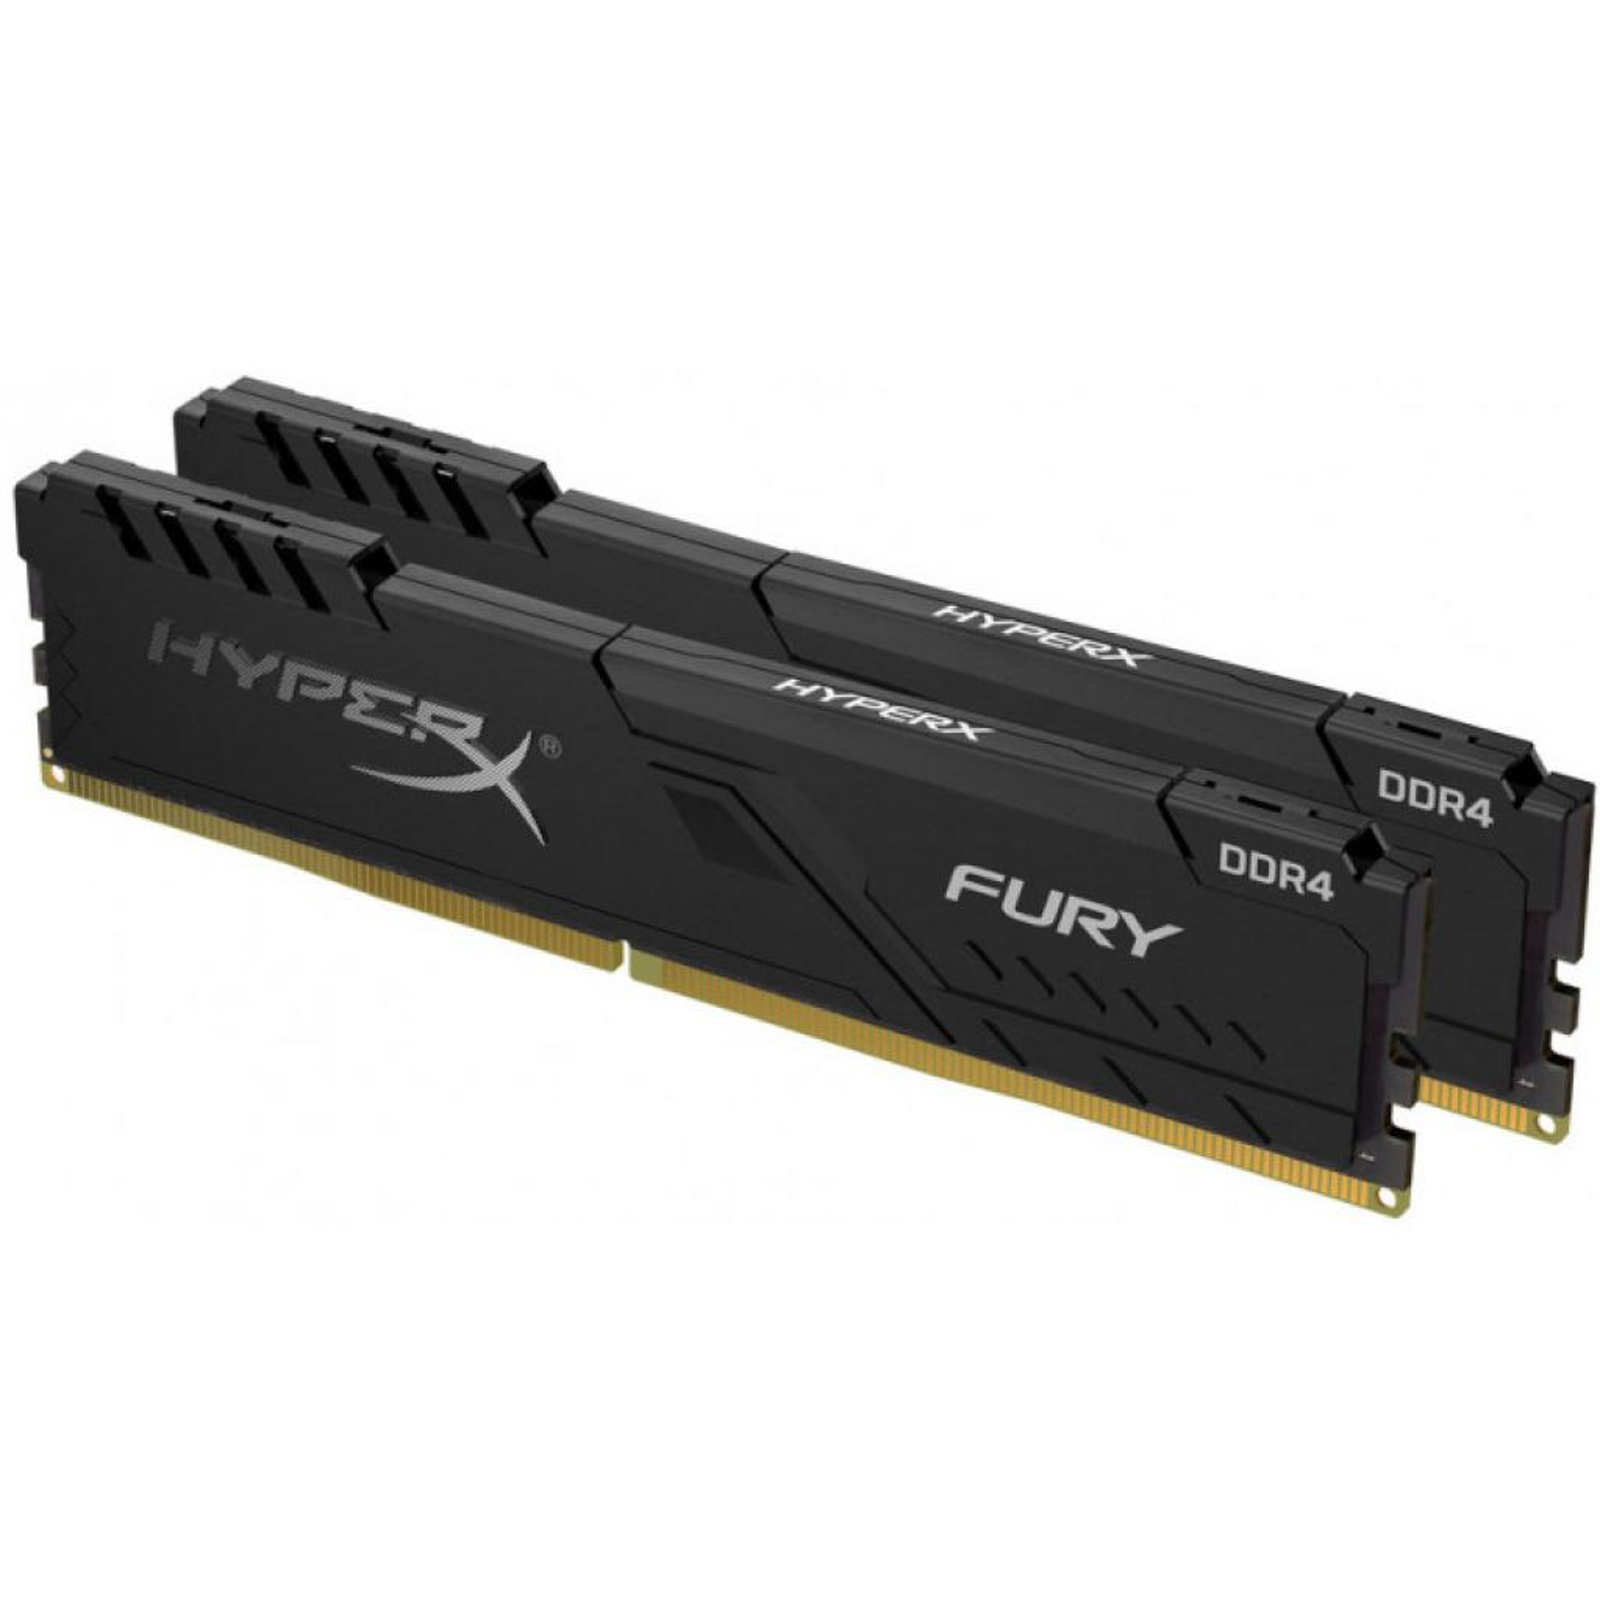 Модуль памяти для компьютера DDR4 8GB (2x4GB) 2666 MHz HyperX Fury Black HyperX (Kingston Fury) (HX426C16FB3K2/8)